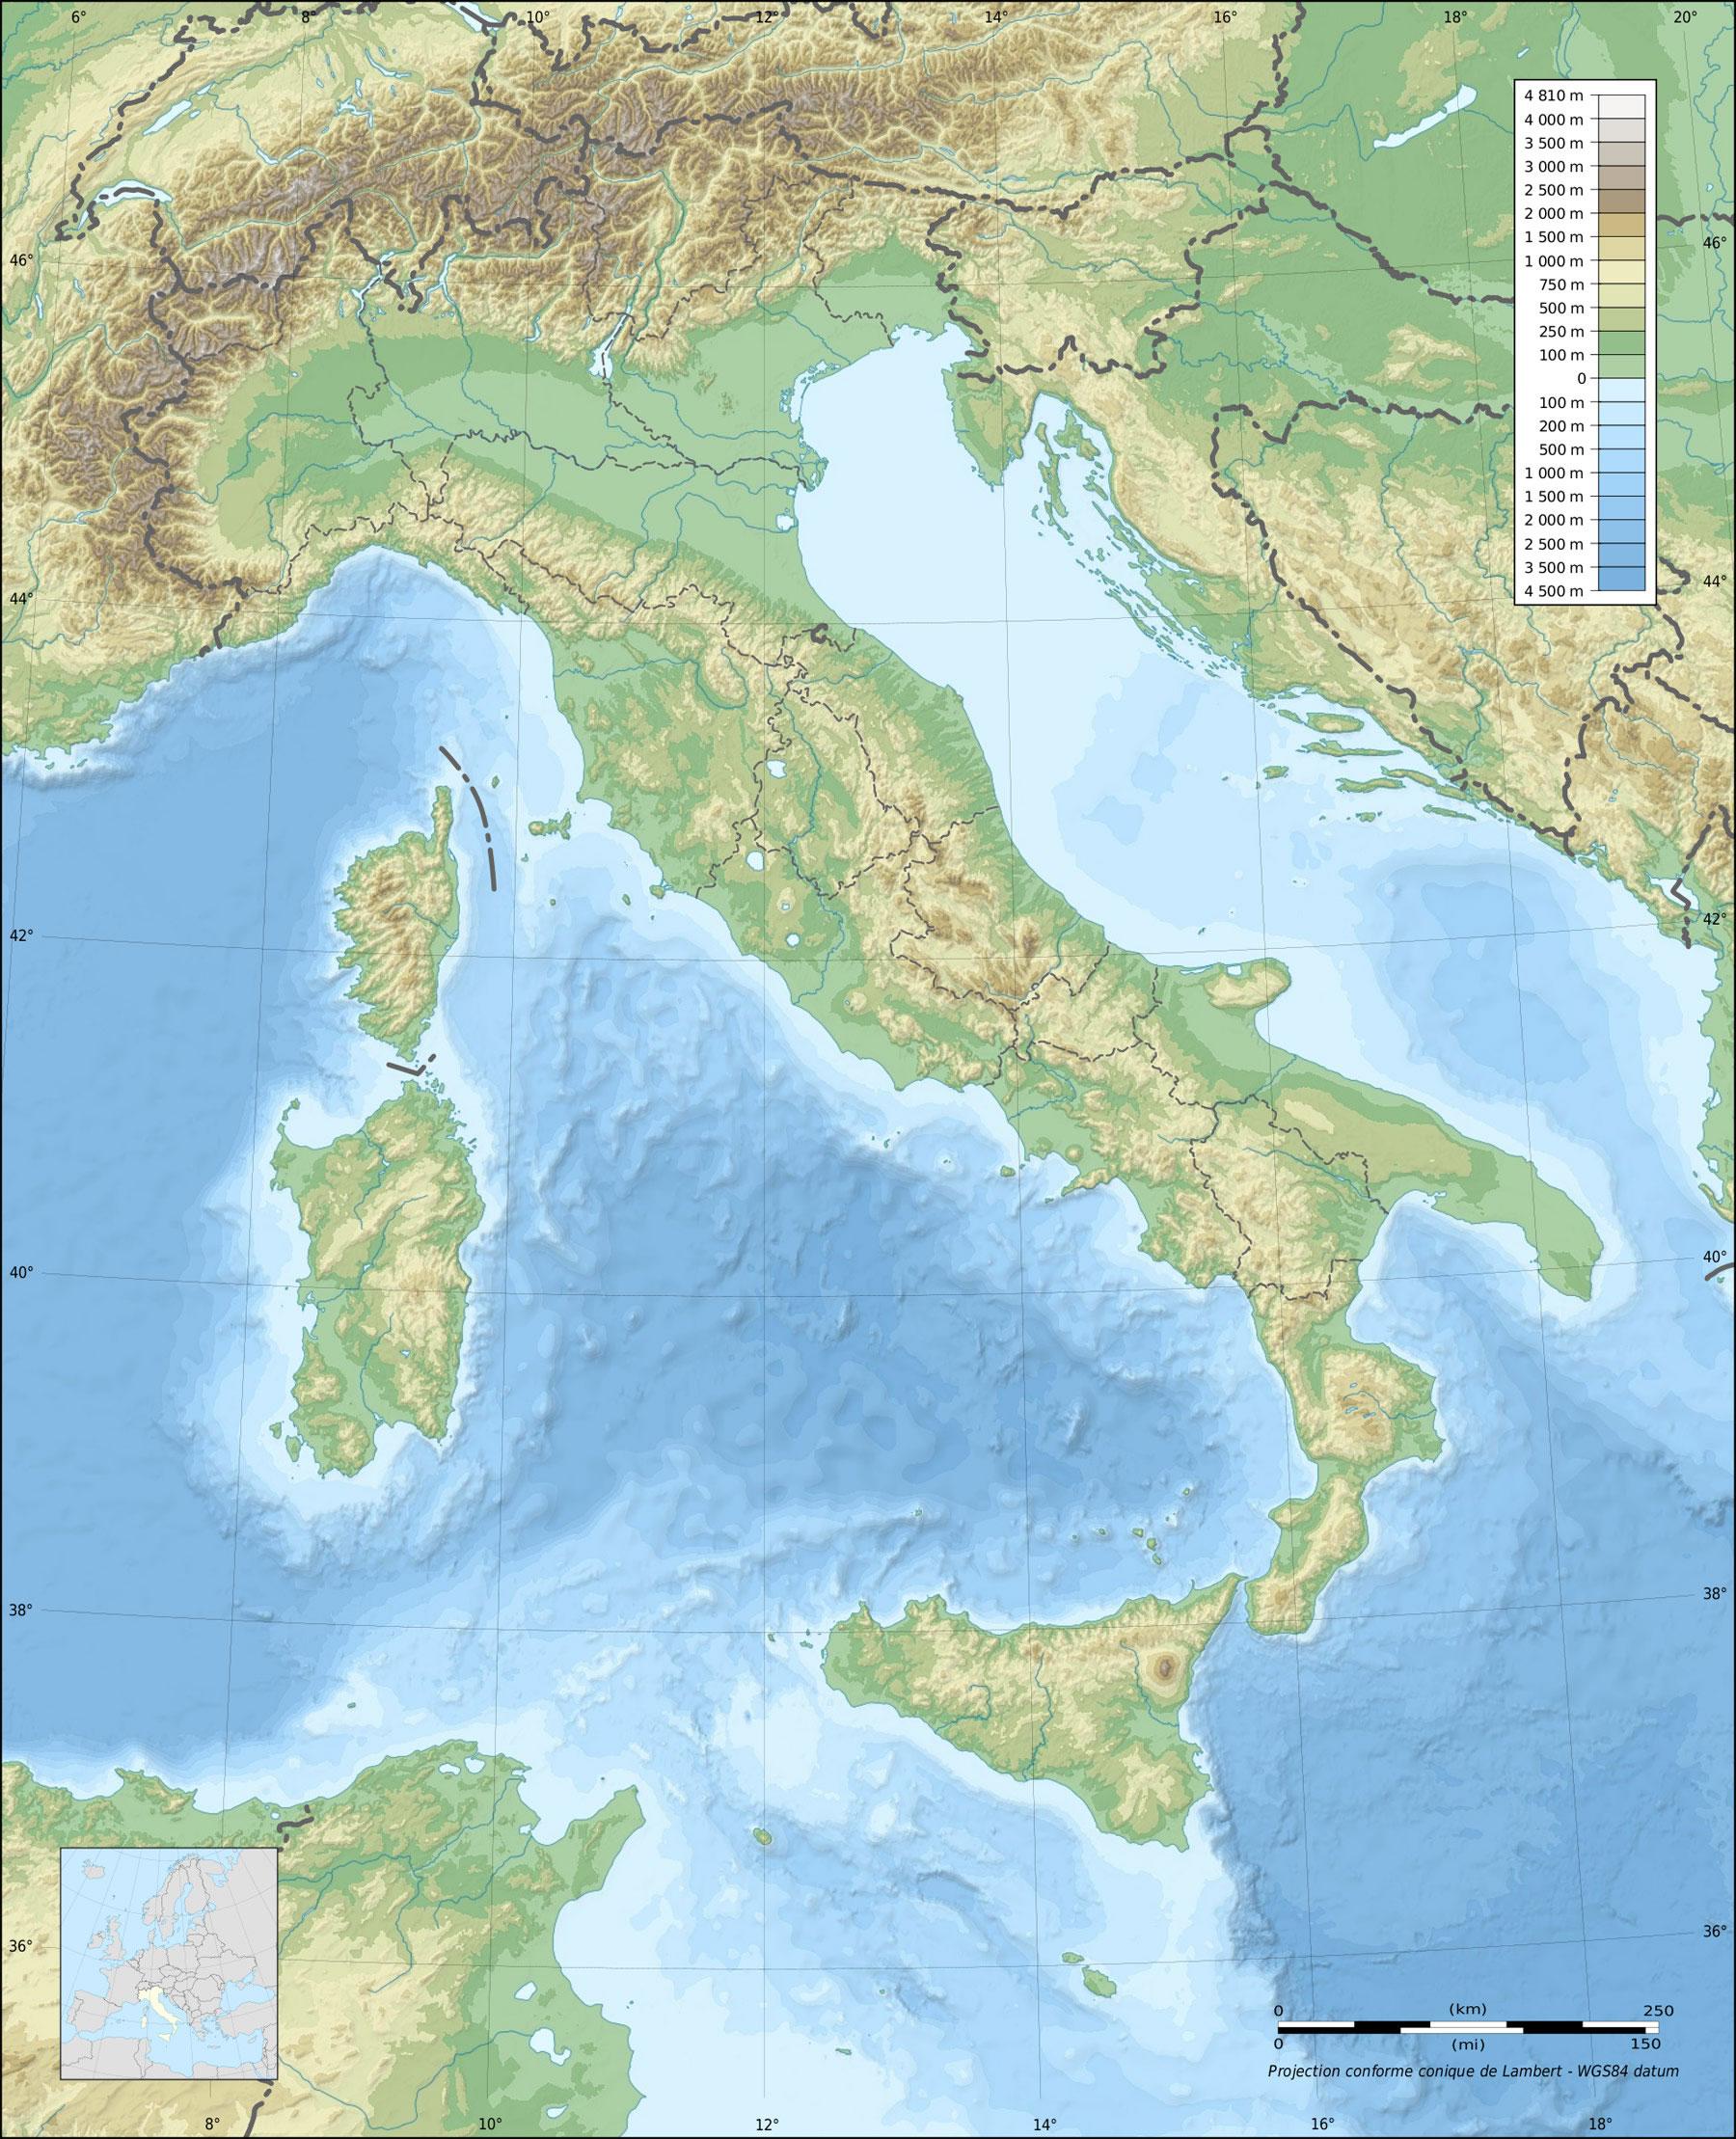 Carte Topographique Italie Carte Topographique De L Italie